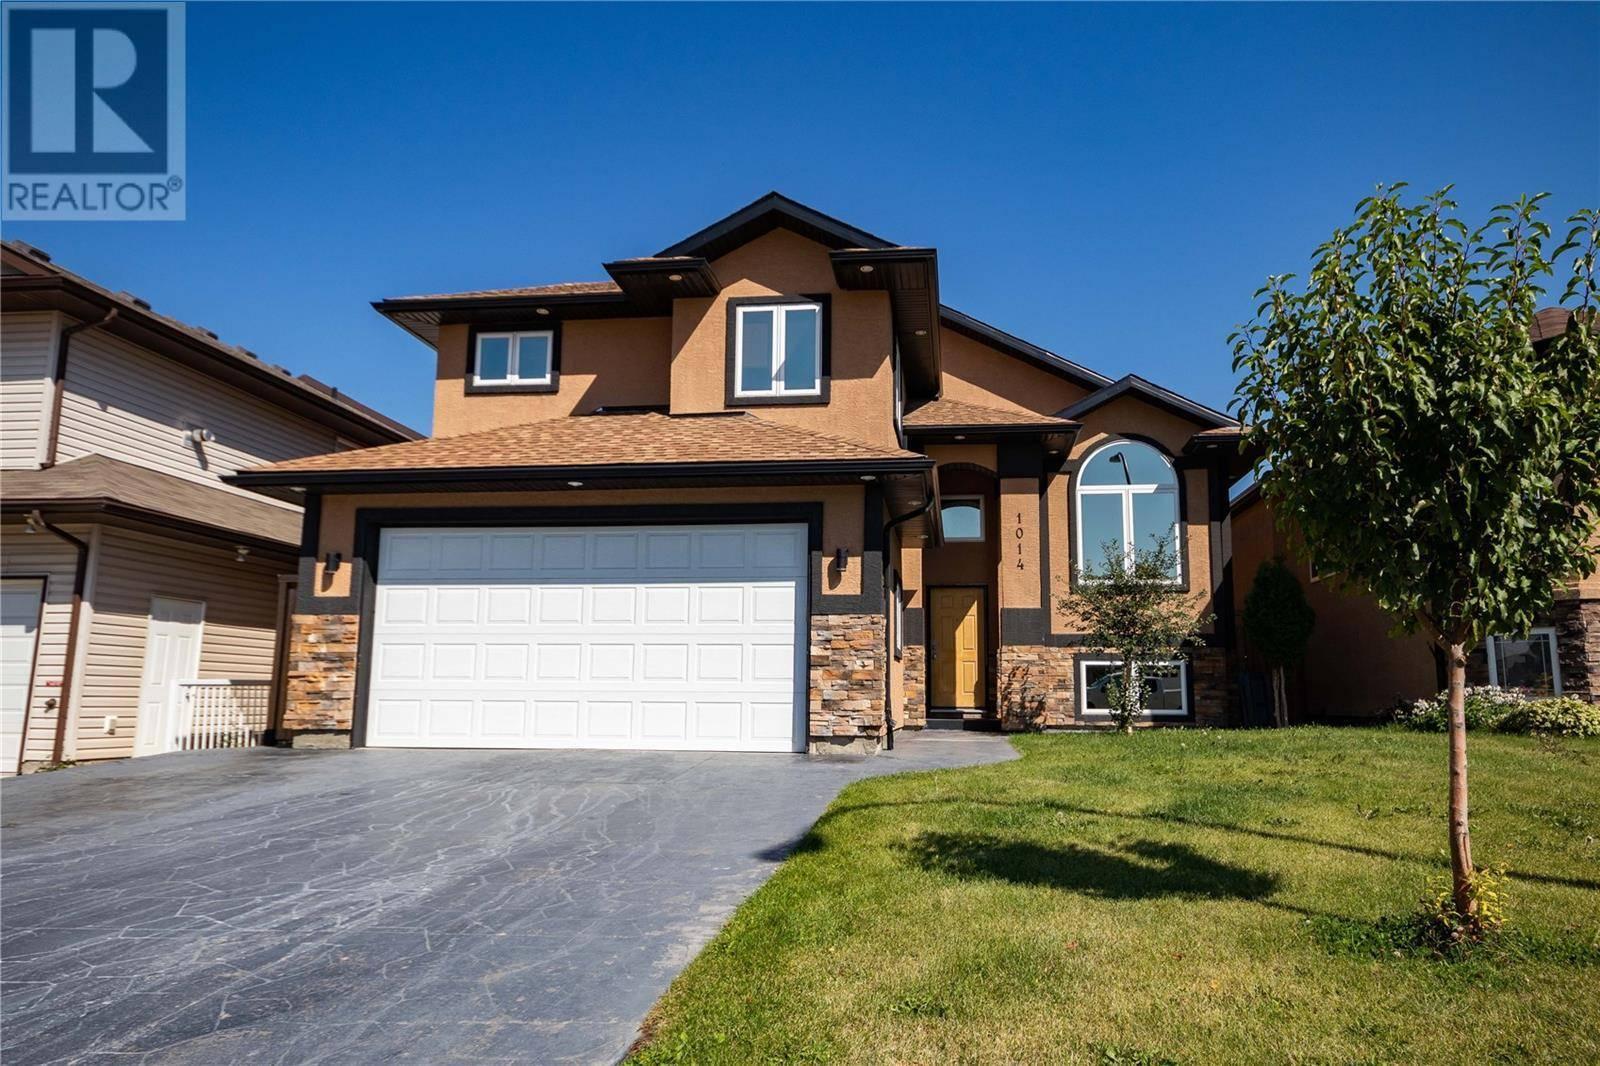 House for sale at 1014 Muzyka Rd Saskatoon Saskatchewan - MLS: SK785827